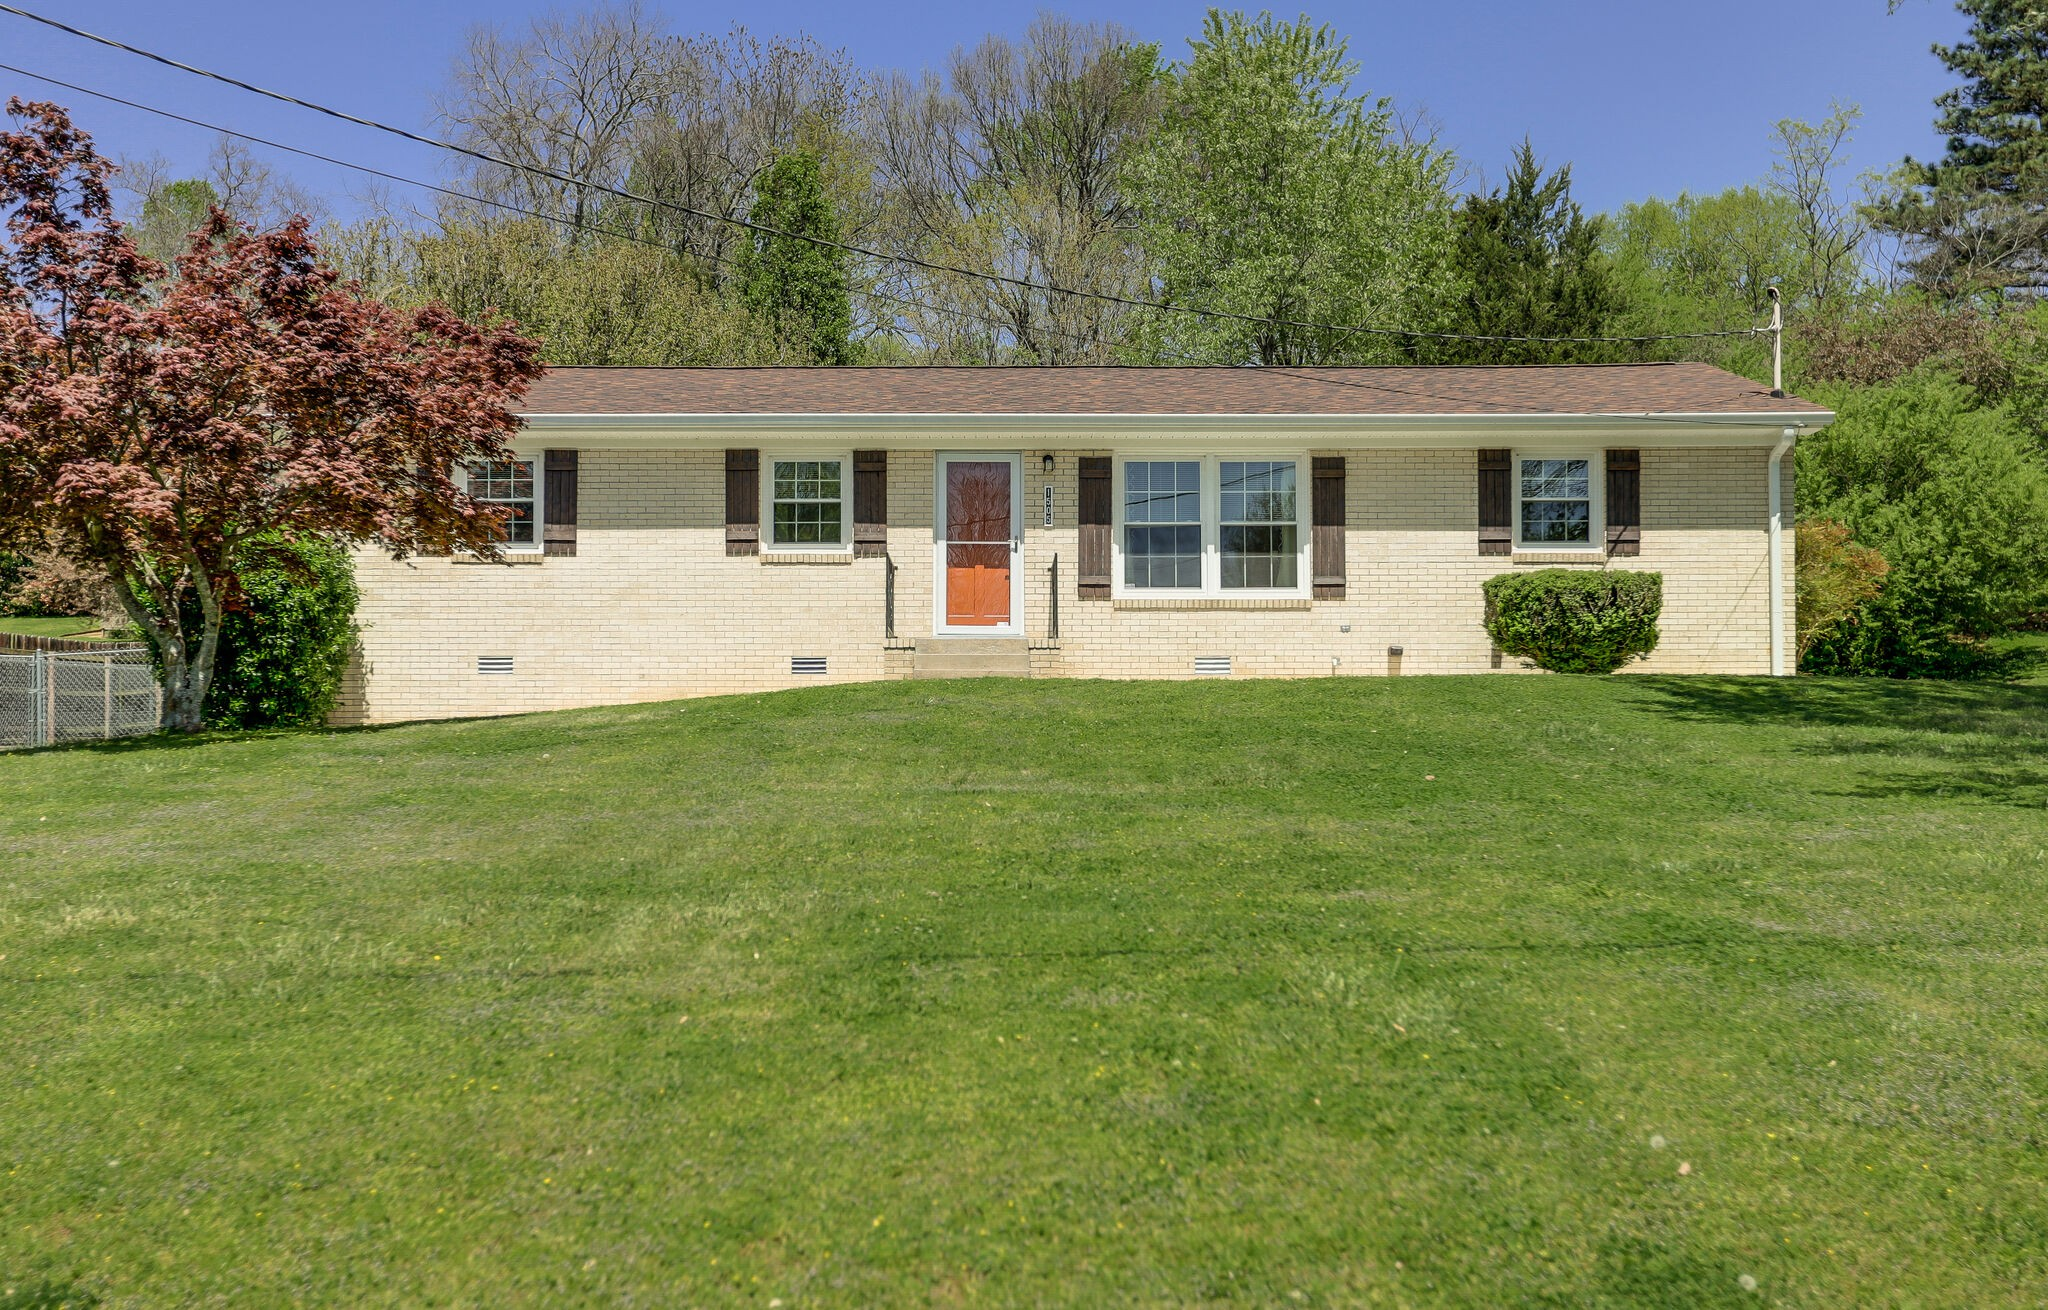 1505 Sandy St Property Photo - Lewisburg, TN real estate listing